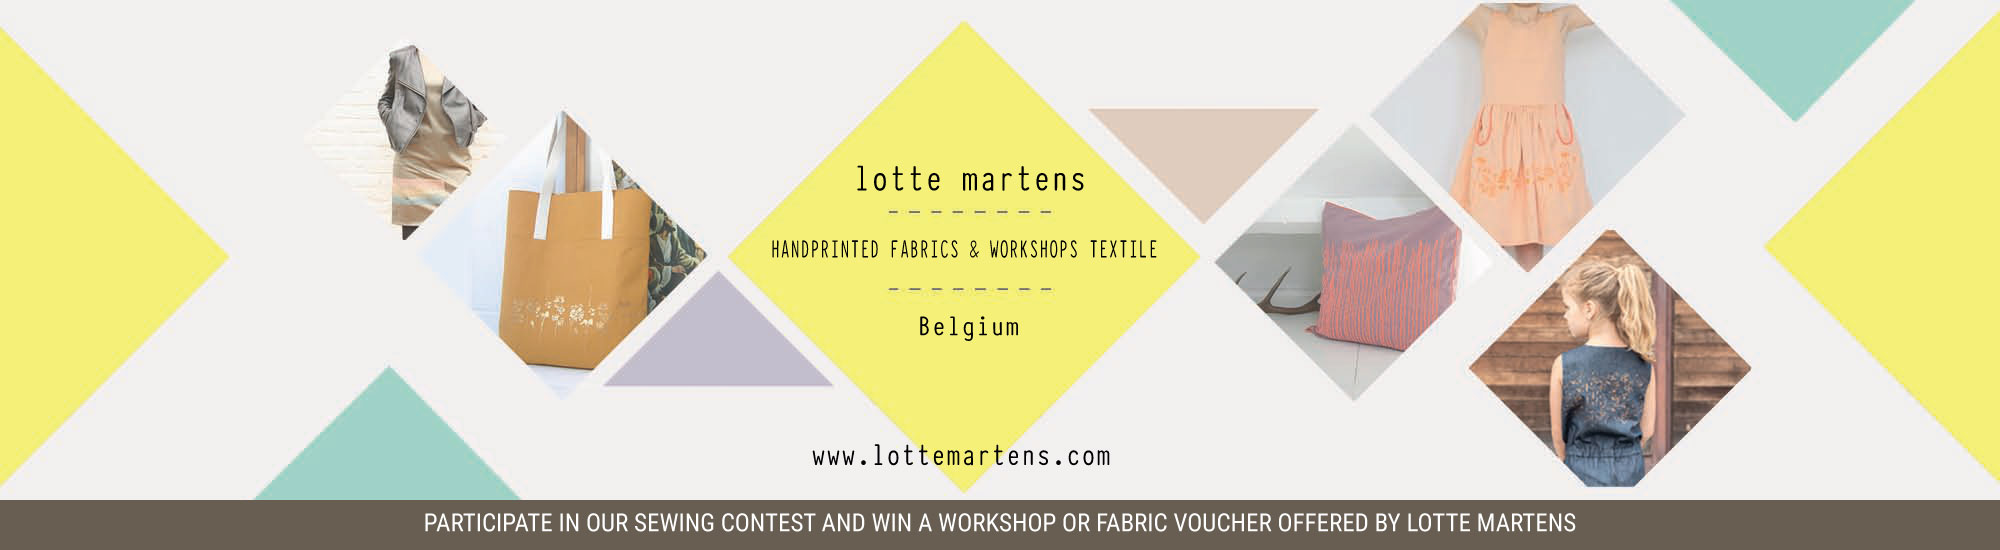 banners-sponsors_lottemartens